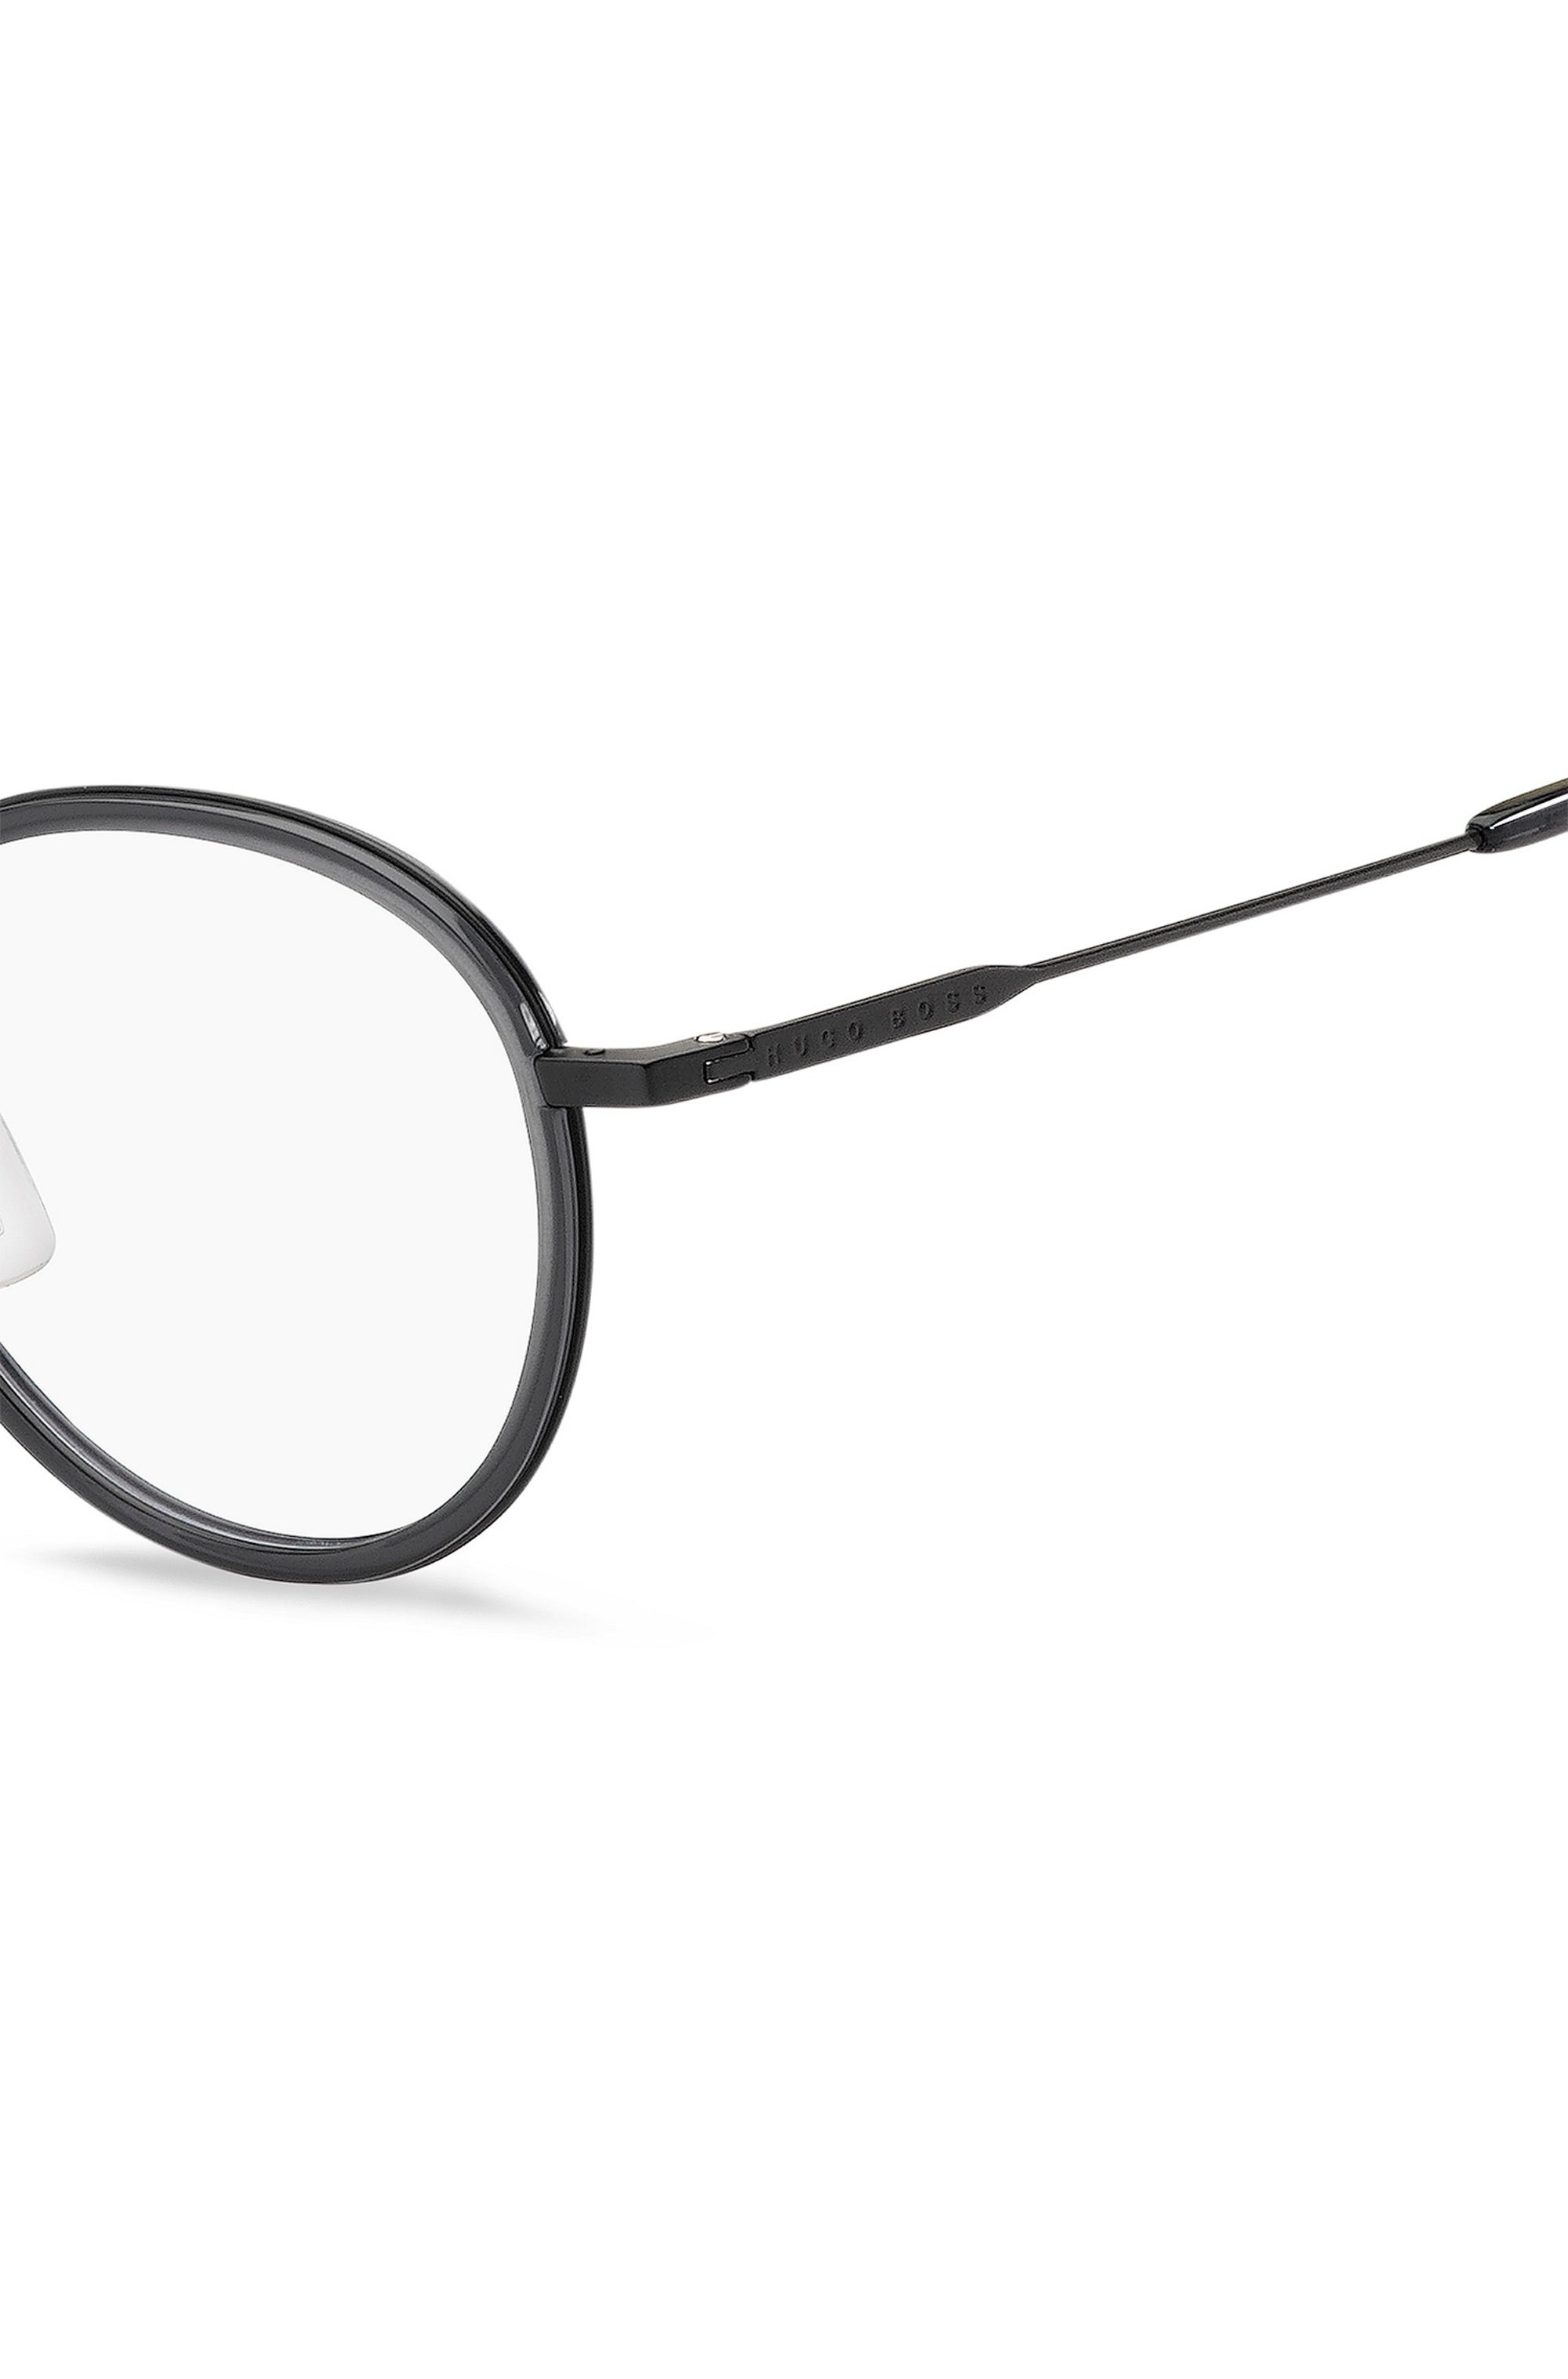 Round optical frames in matte grey-black